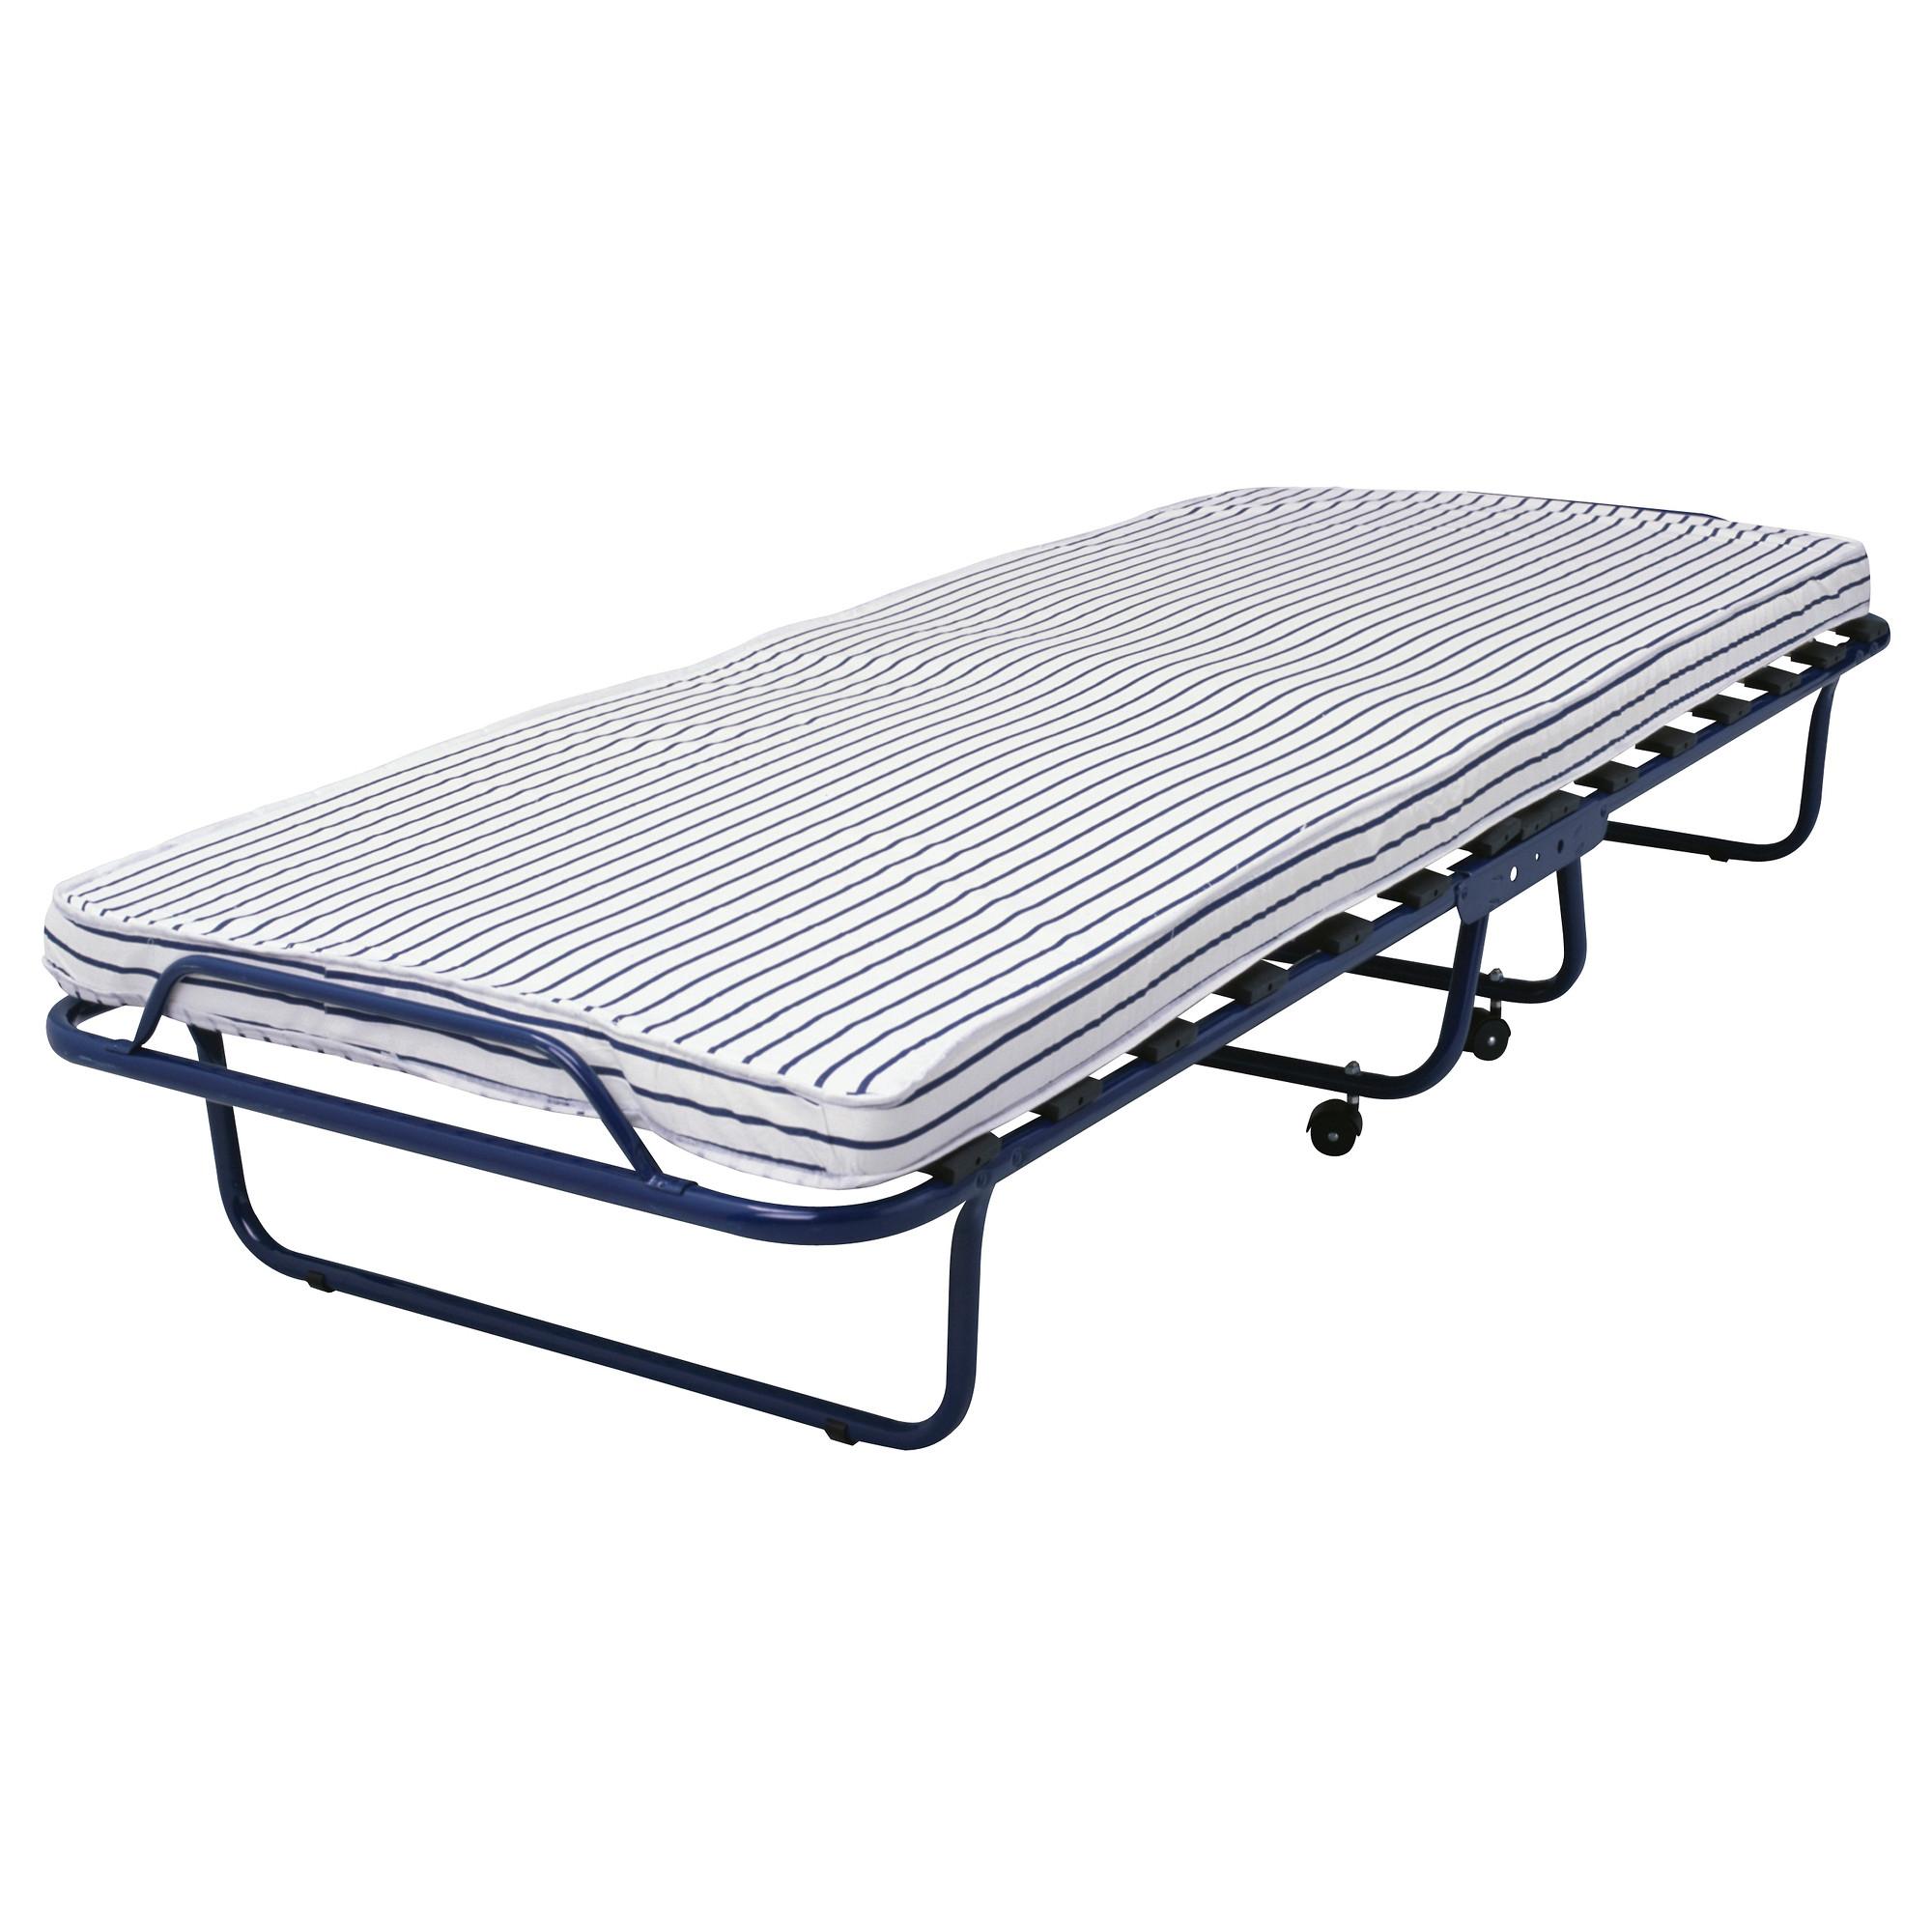 SANDVIKA cama plegable